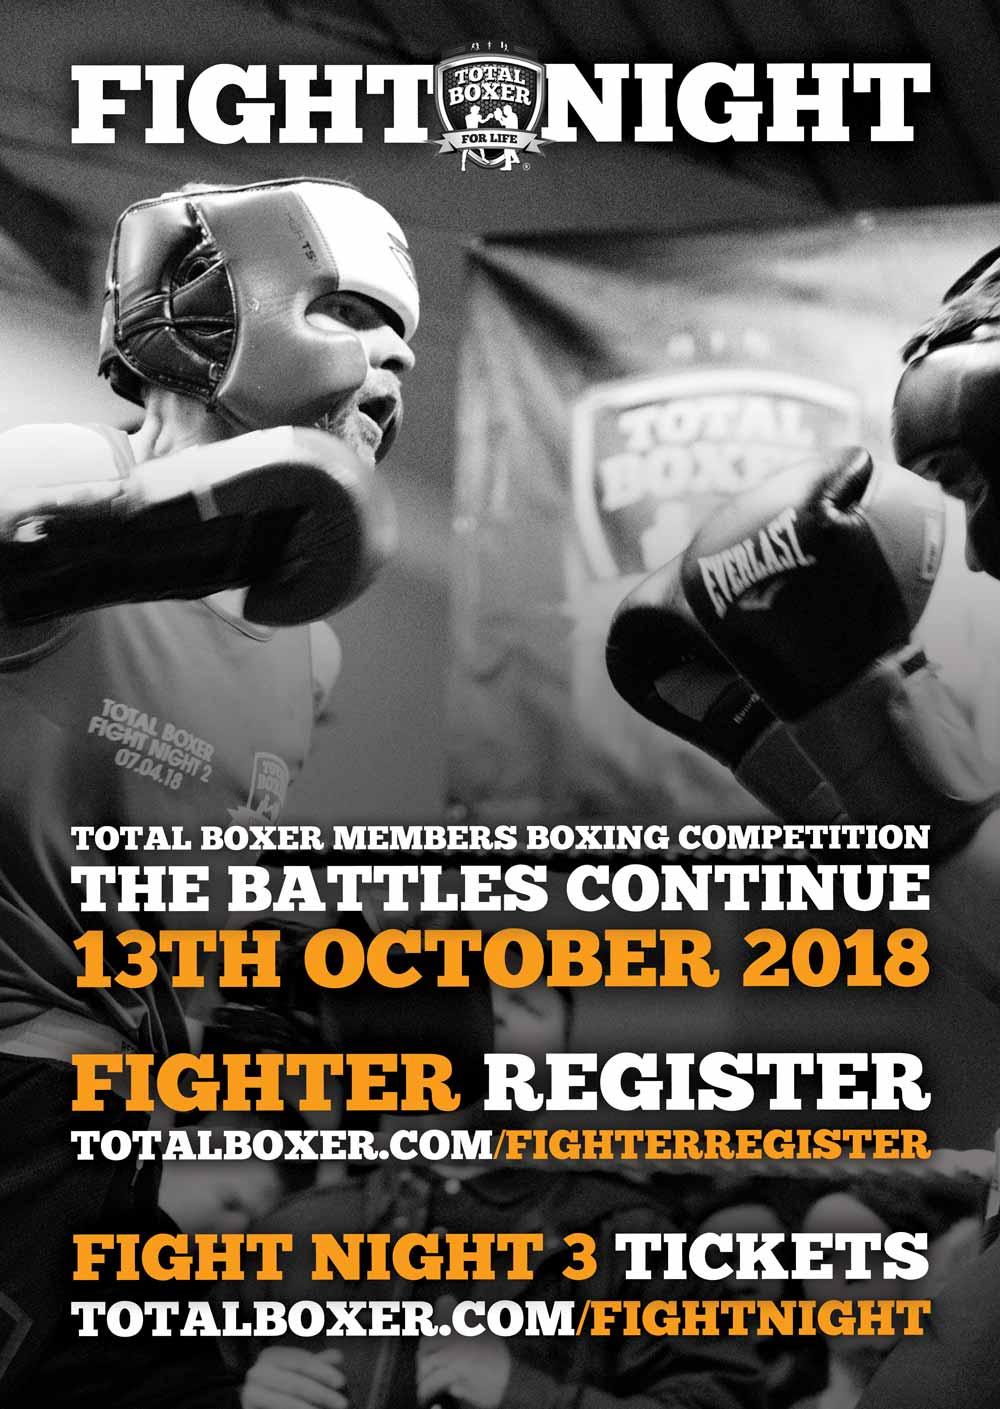 Fight-Night-Poster-03lores.jpg